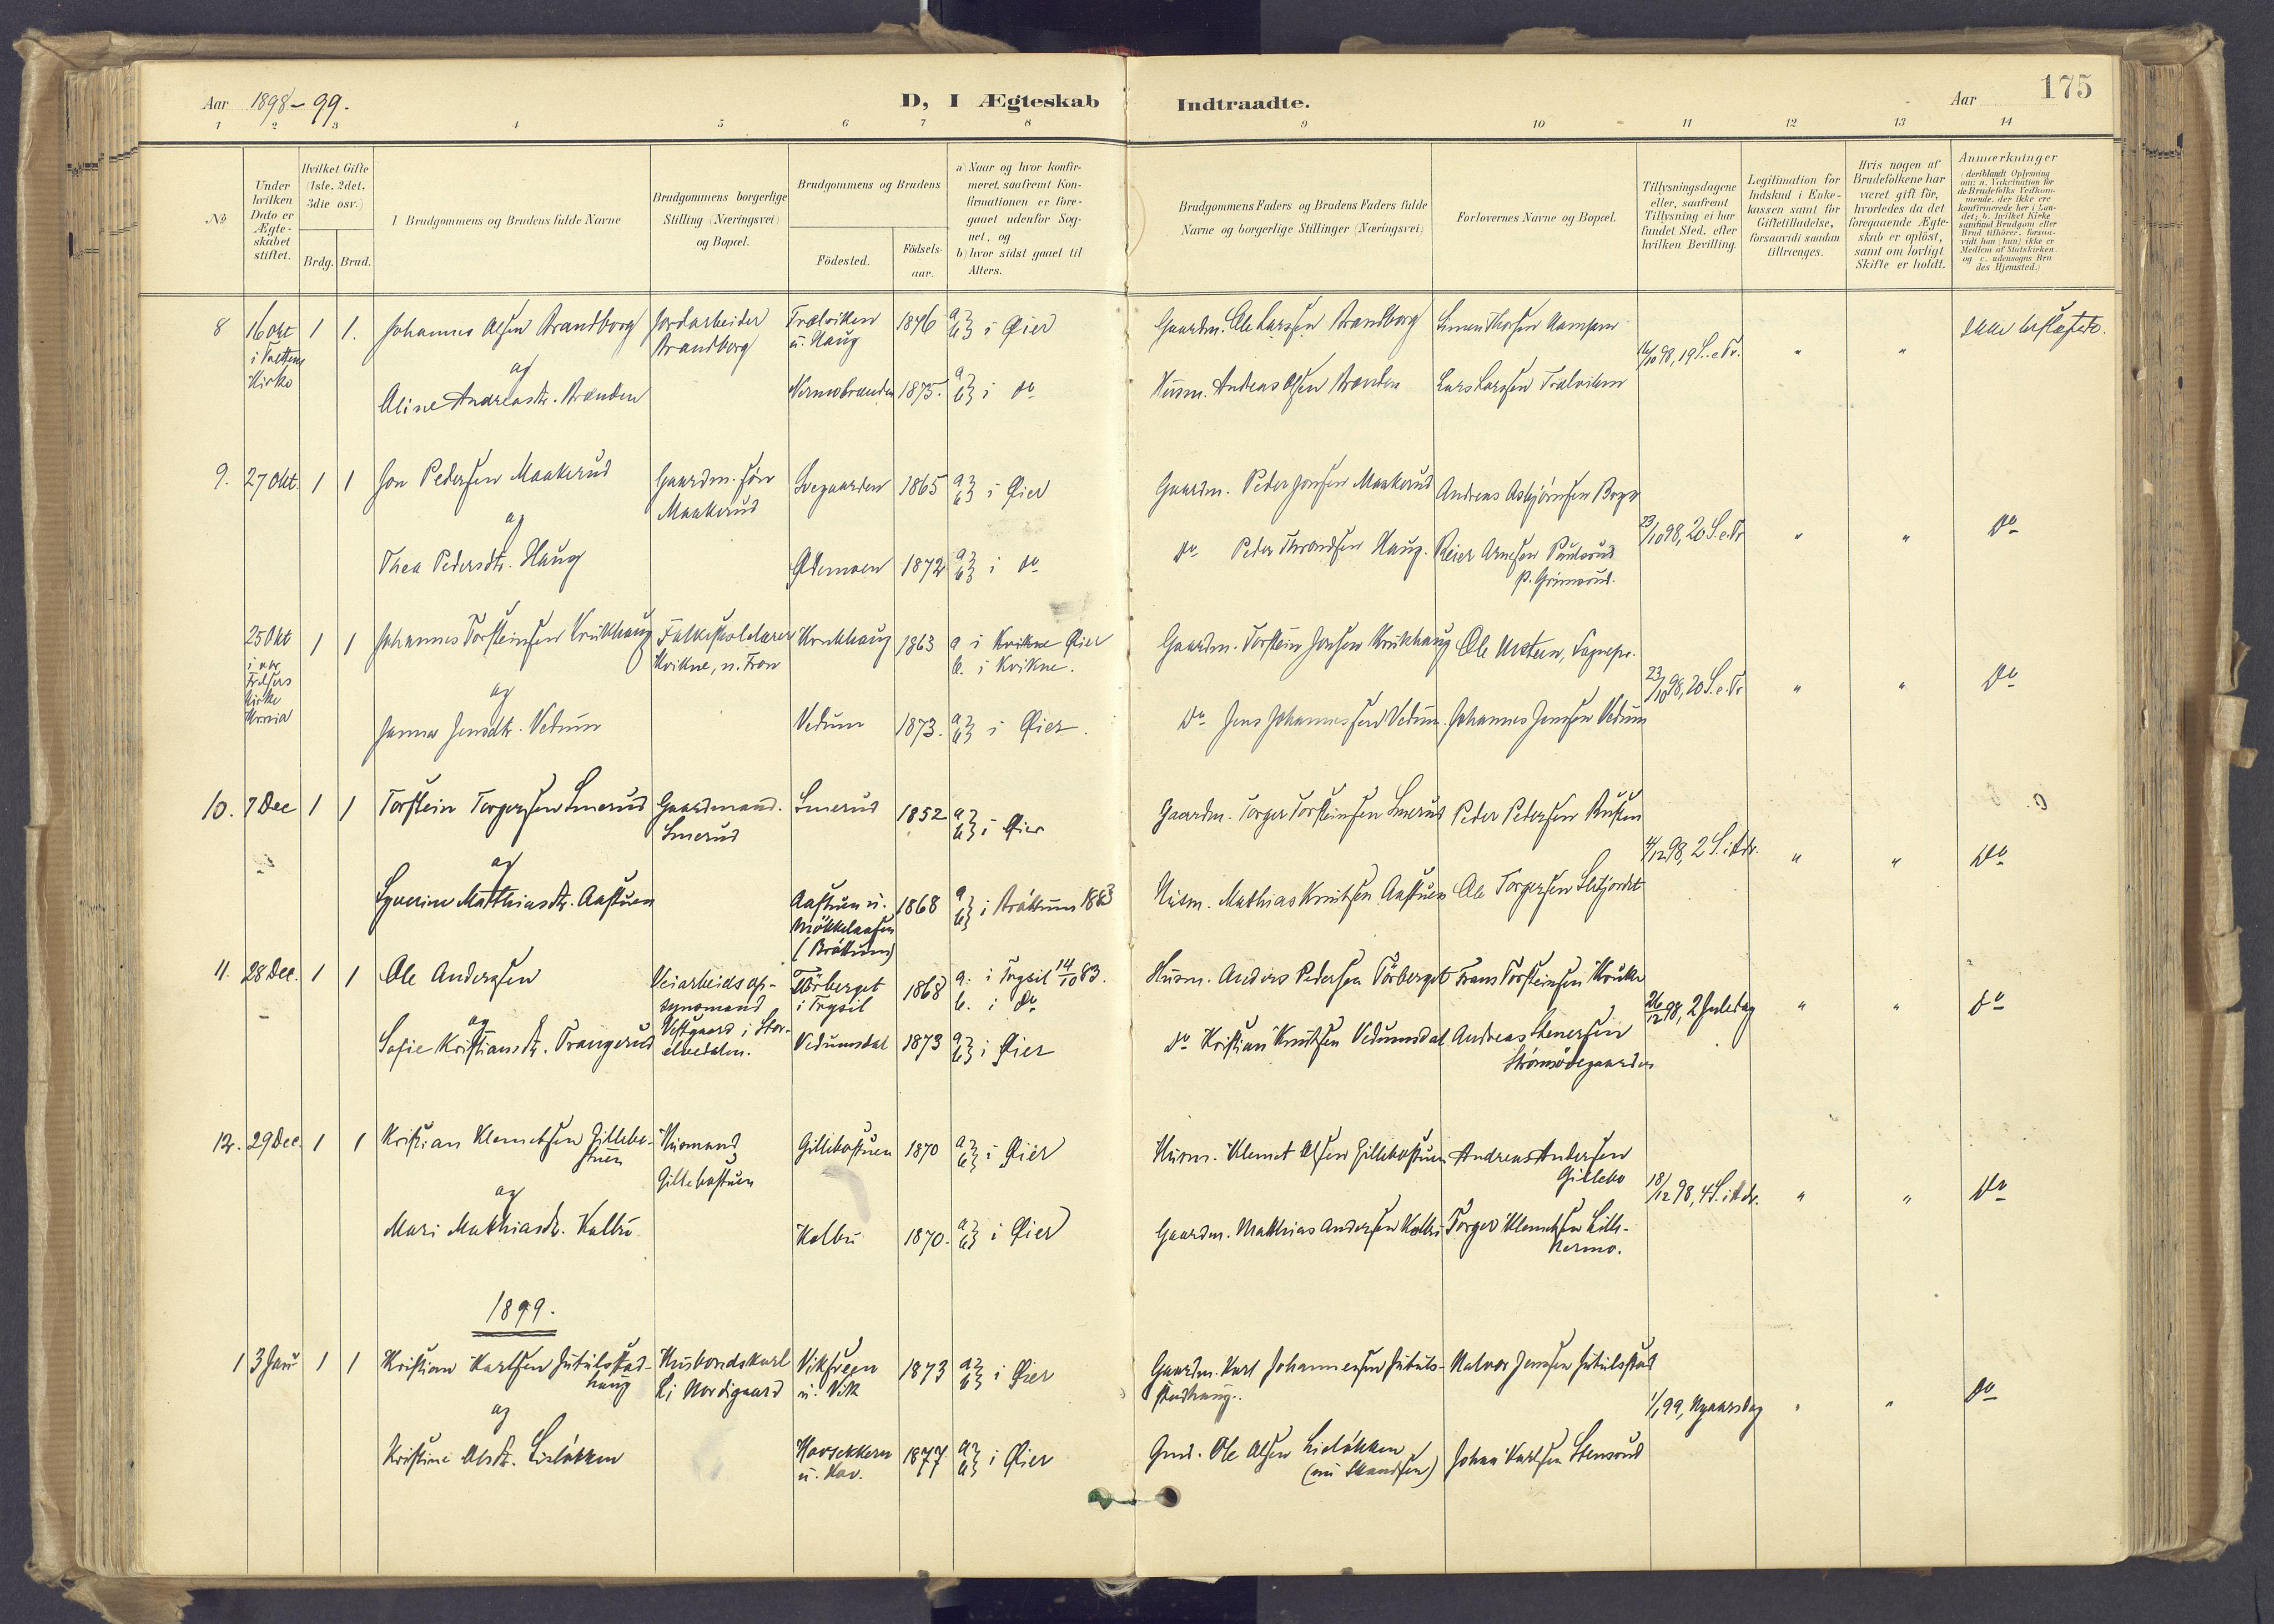 SAH, Øyer prestekontor, Ministerialbok nr. 12, 1897-1920, s. 175